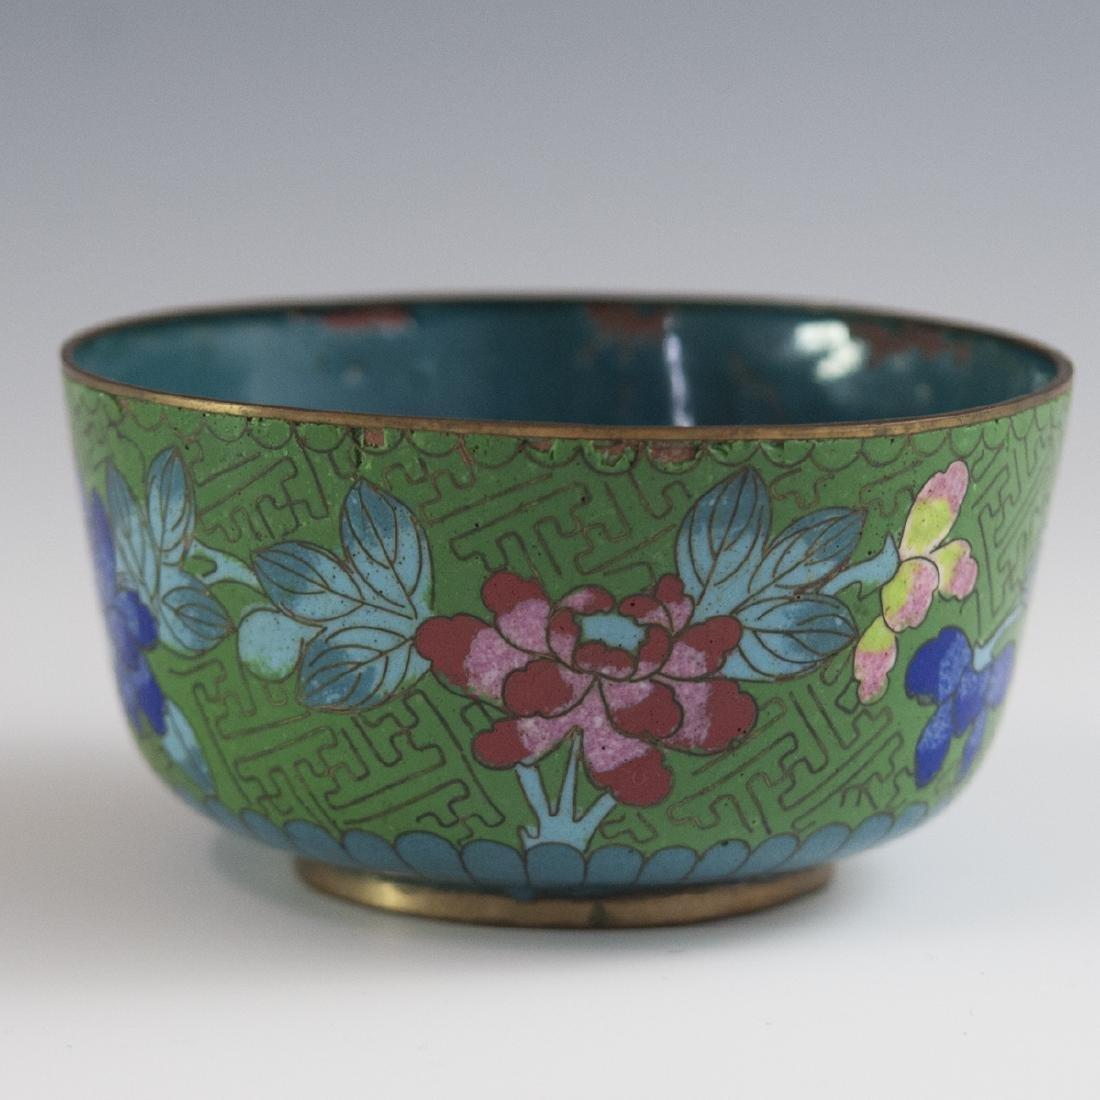 Antique Chinese Enameled Cloisonne Rice Bowl